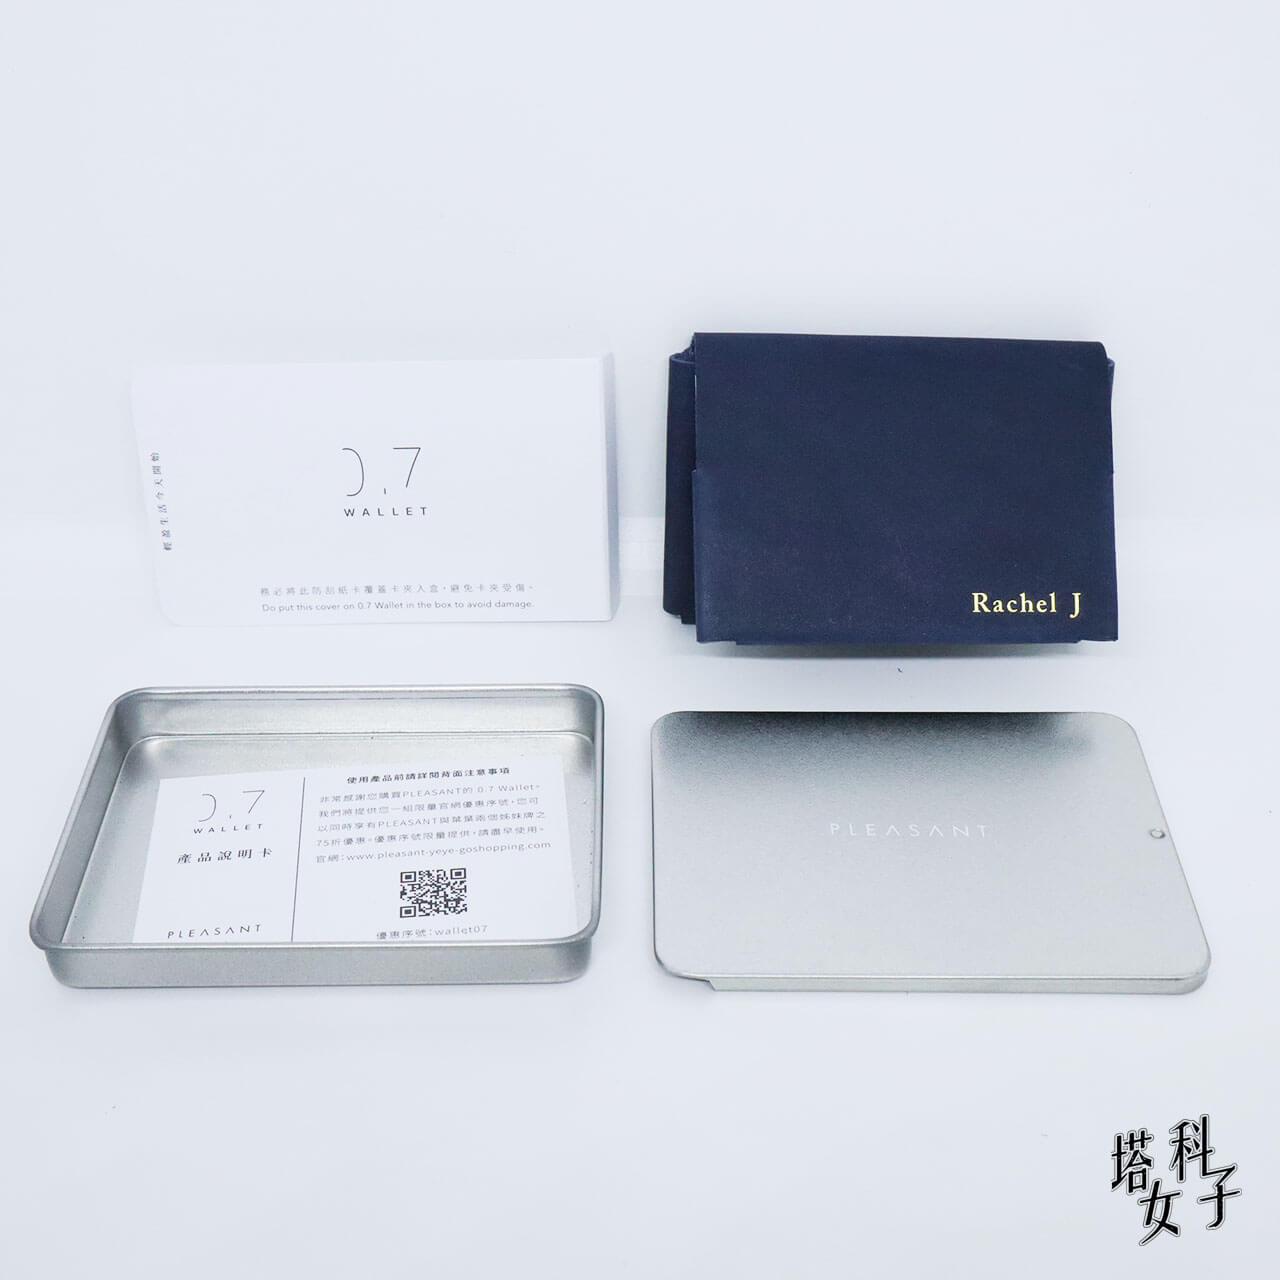 0.7 Wallet 雙面感應卡夾 內容物